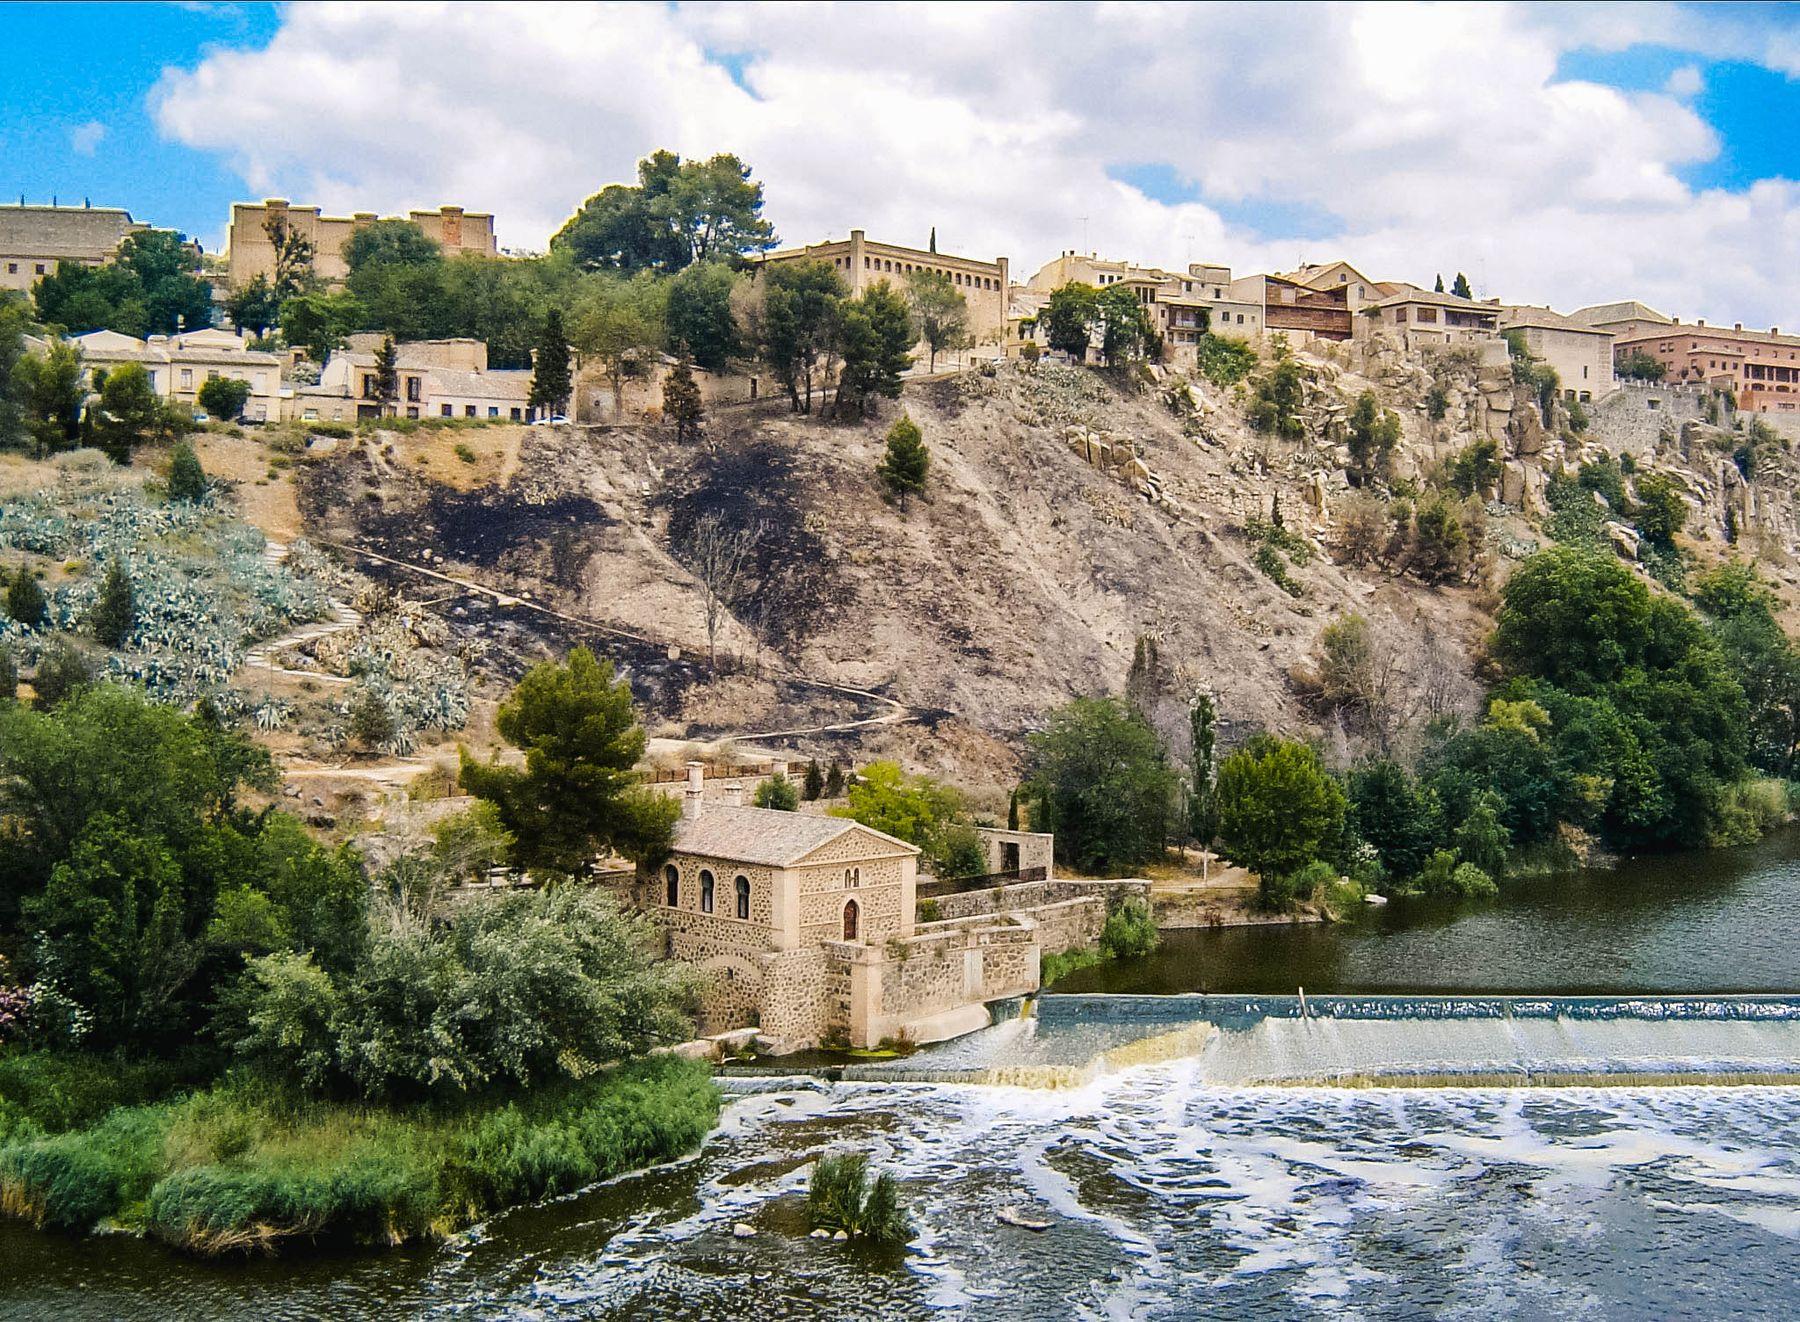 Река Тежу, Толедо, Испания (13.06.2005)